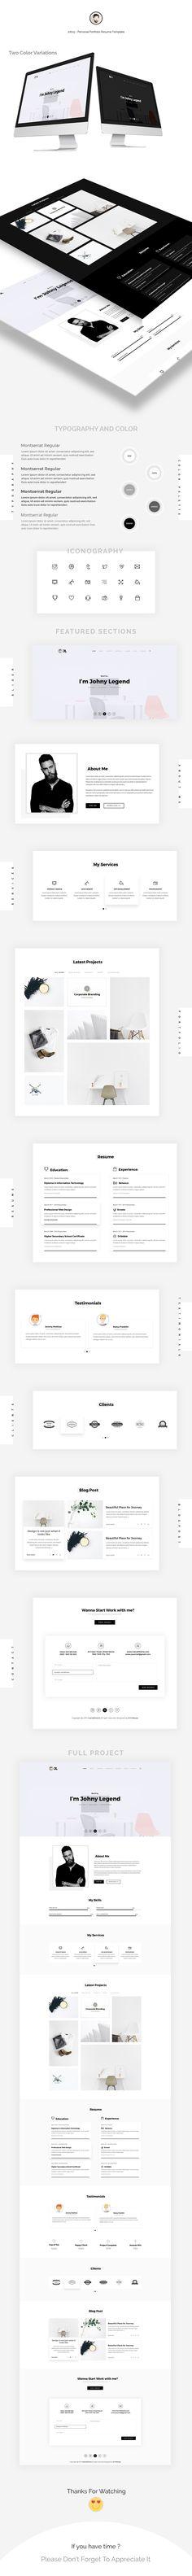 Vedi questo progetto @Behance: \u201cJohny Personal Portfolio Template\u201d https://www.behance.net/gallery/52881357/Johny-Personal-Portfolio-Template